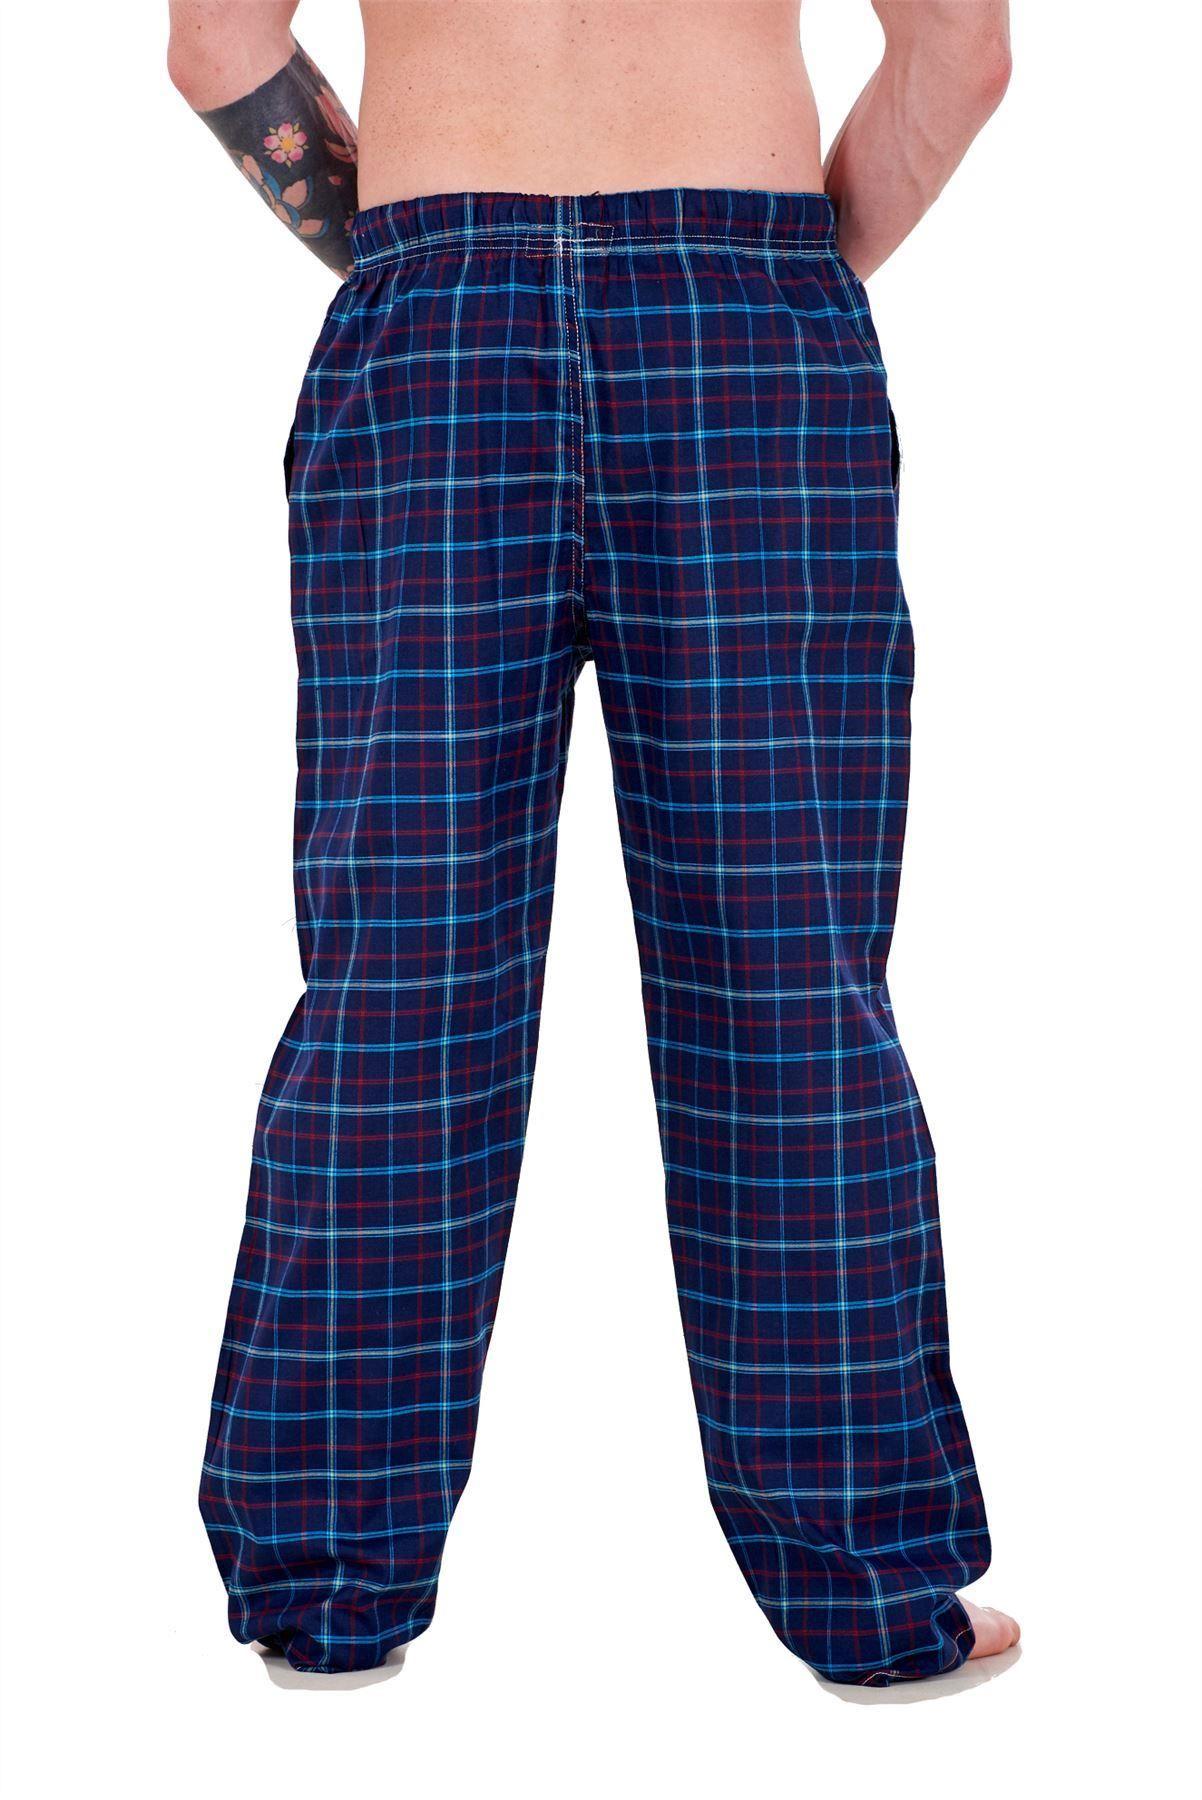 Mens-Pyjama-Bottoms-Rich-Cotton-Woven-Check-Lounge-Pant-Nightwear-Big-3XL-to-5XL Indexbild 42